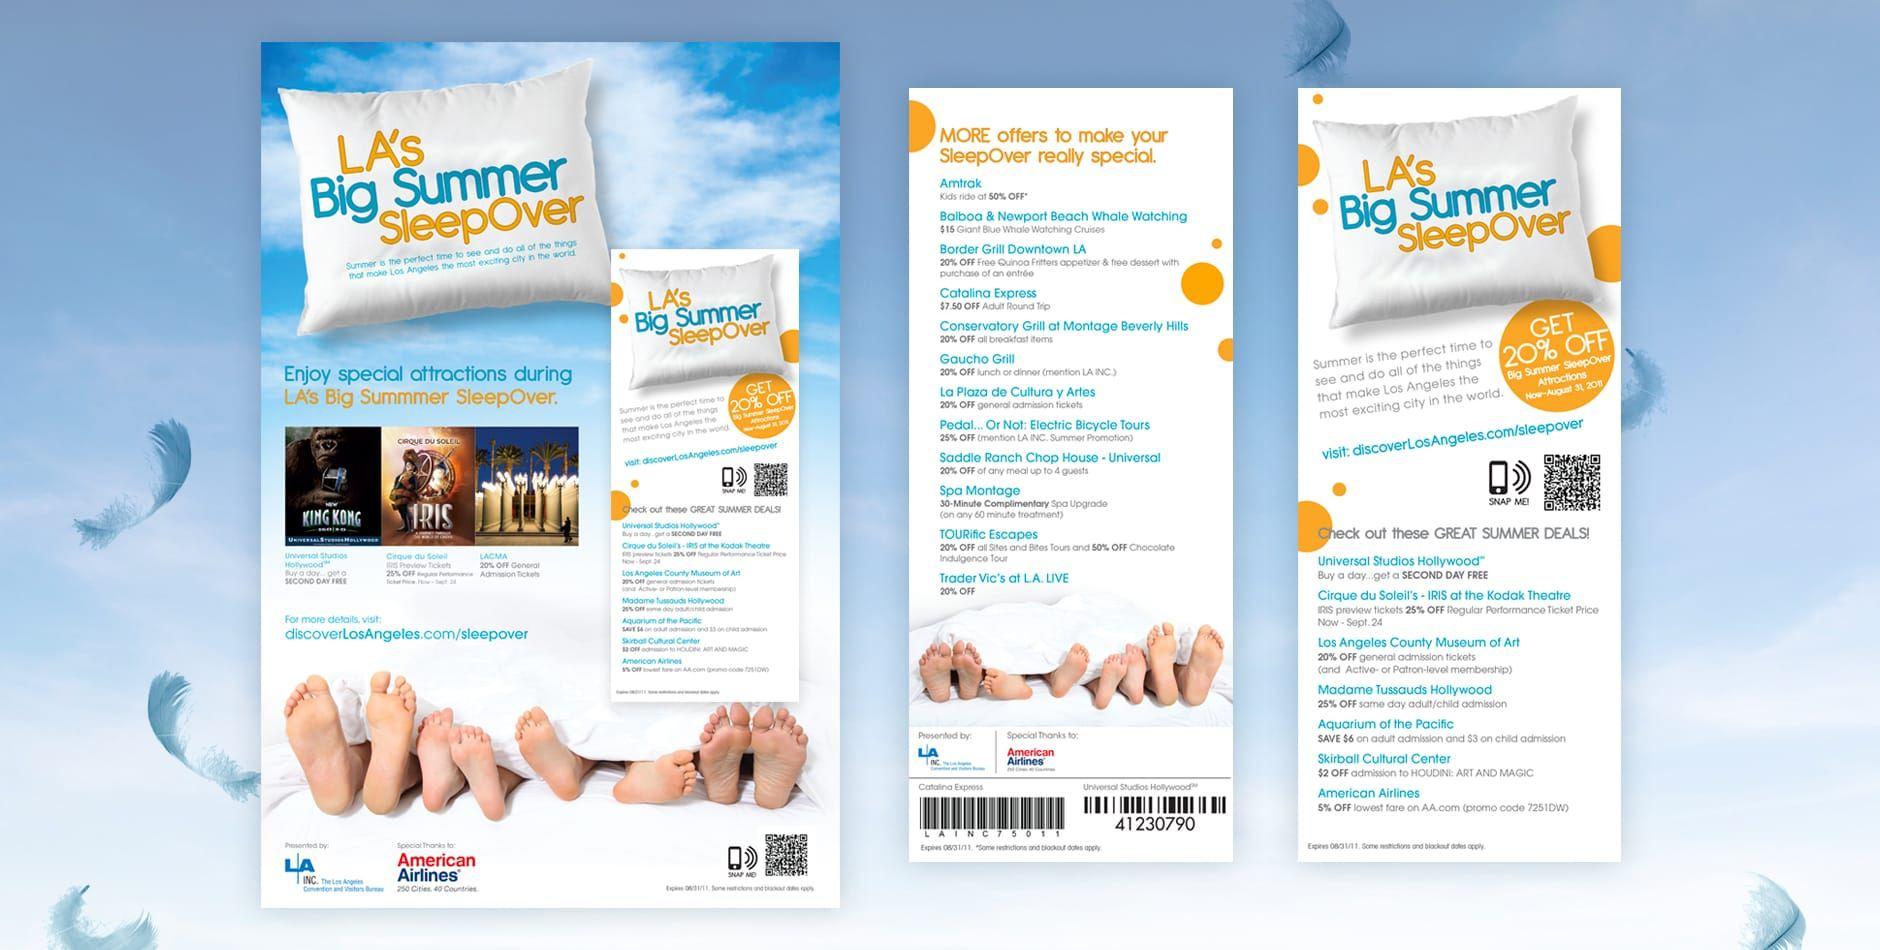 los angeles big summer sleepover promotion rack card